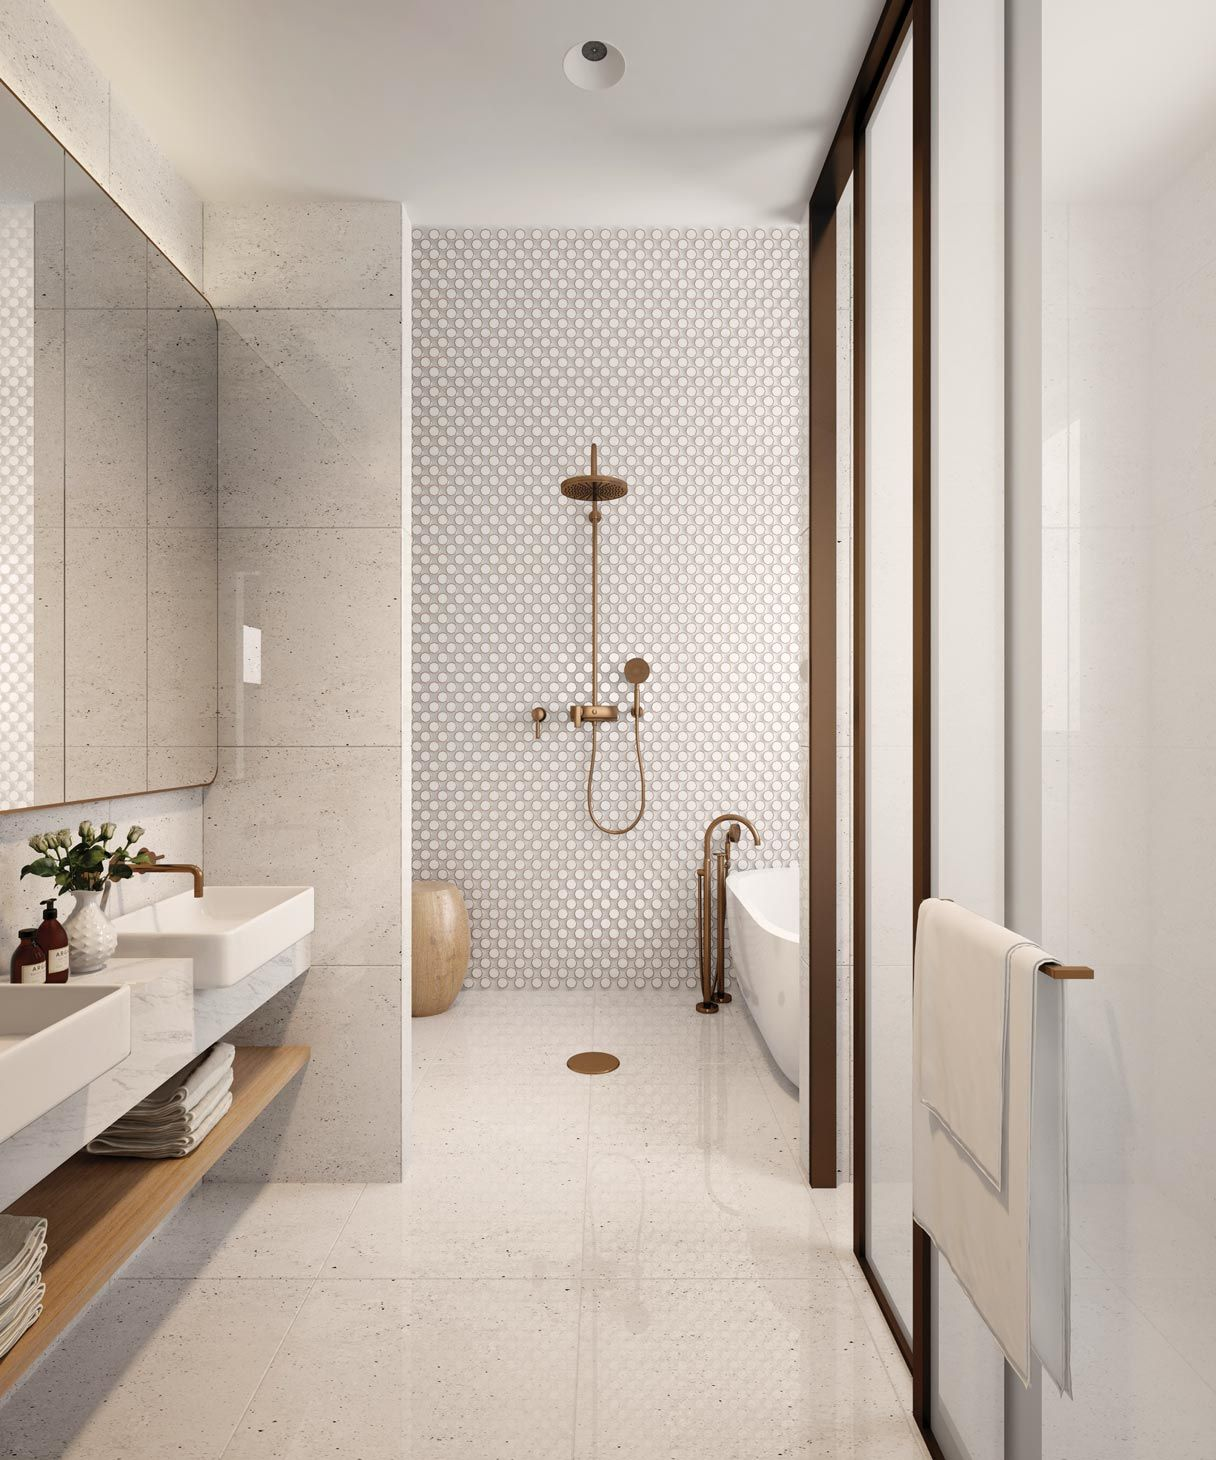 opt_bathroom_3 | 집 | pinterest | baños